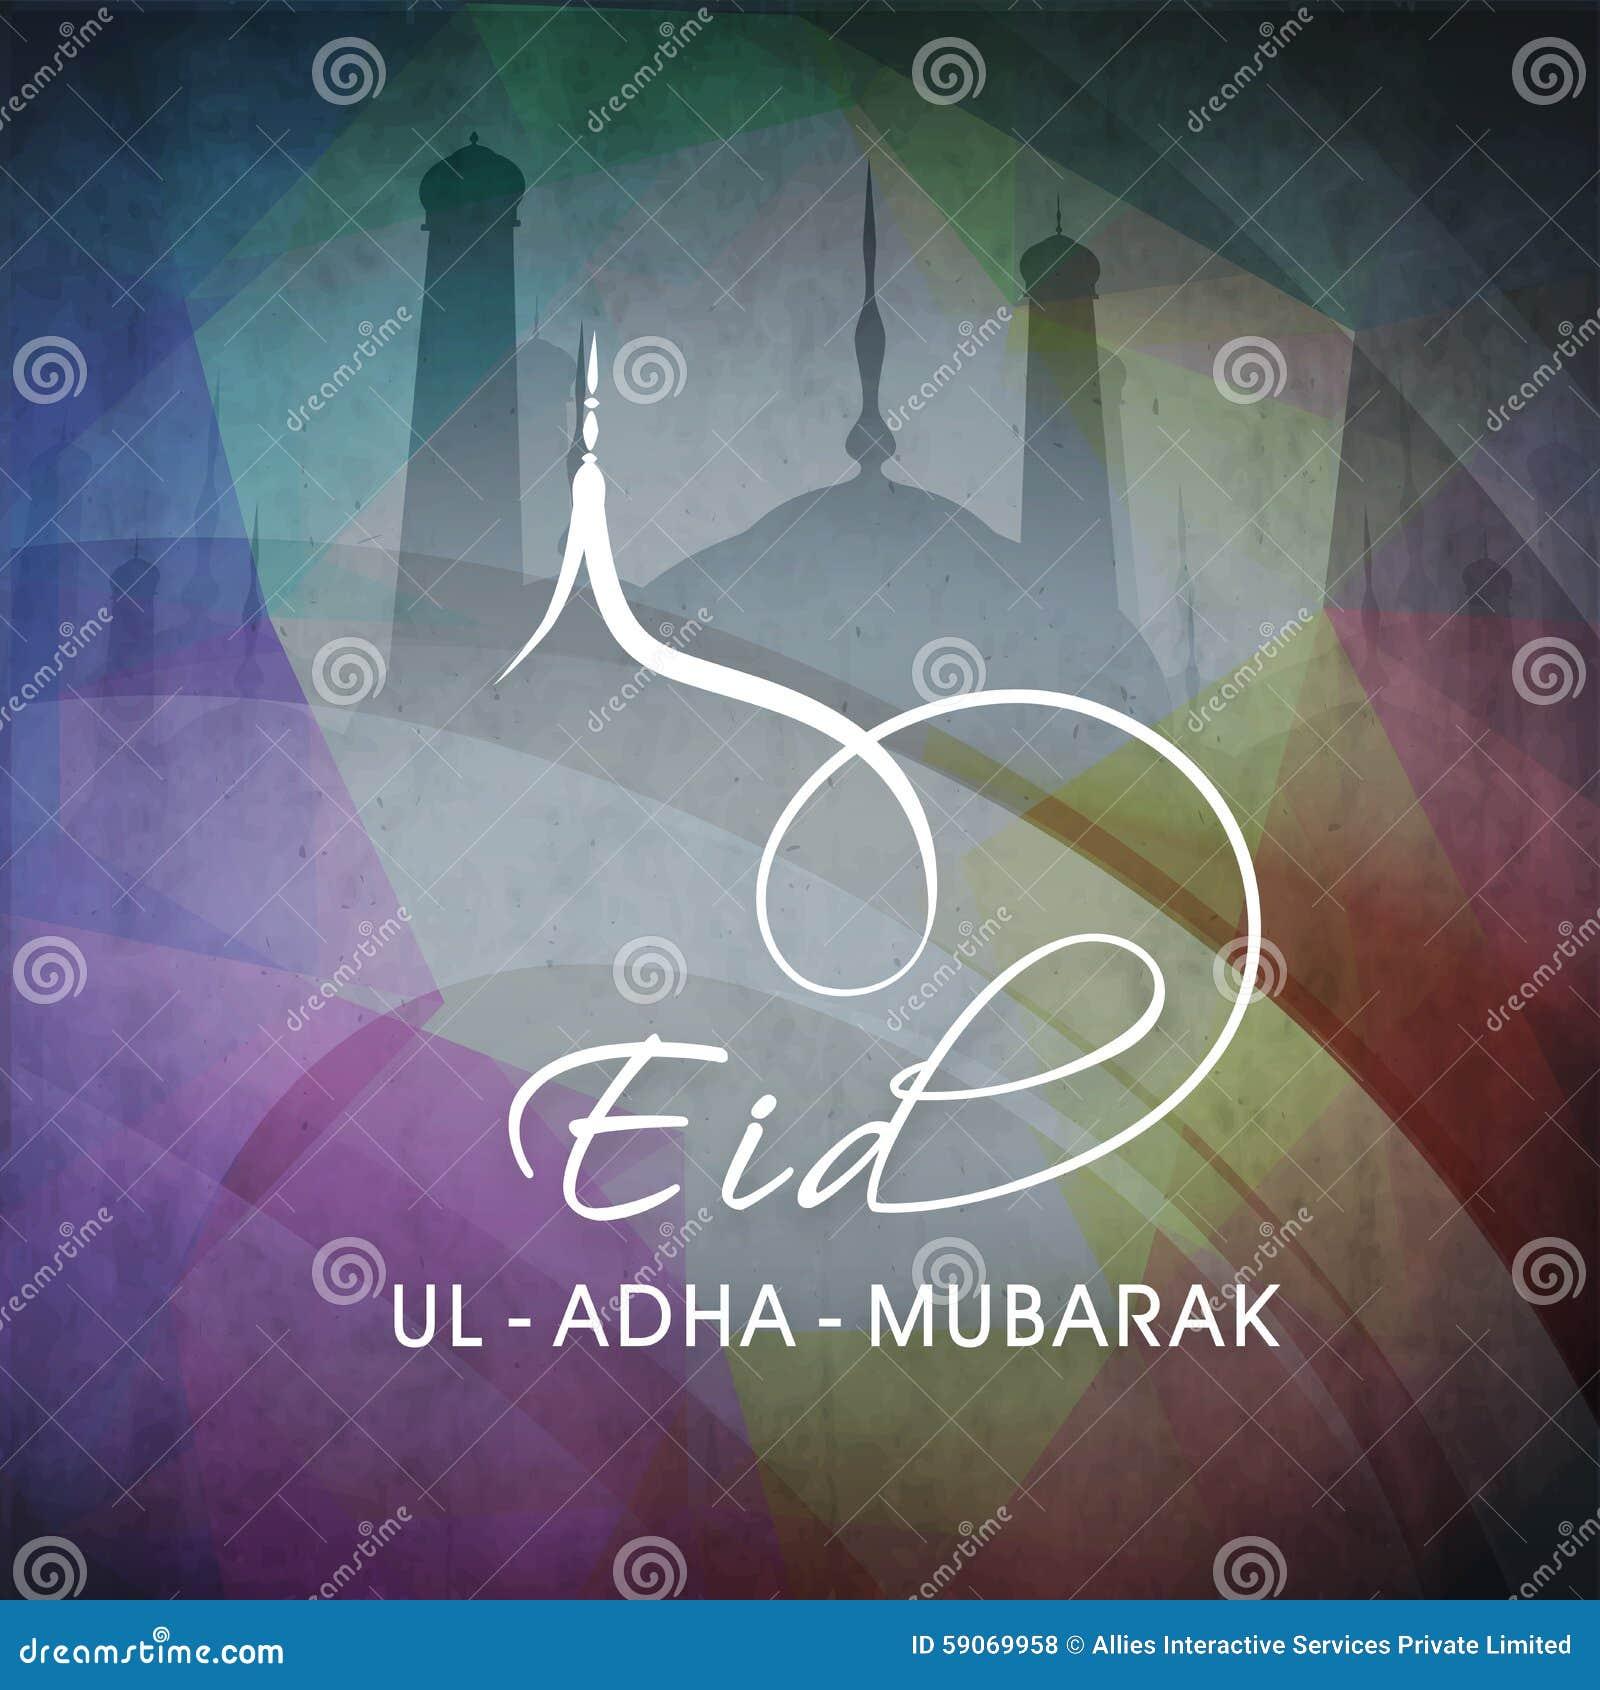 Greeting Card For Eid Ul Adha Celebration Stock Illustration